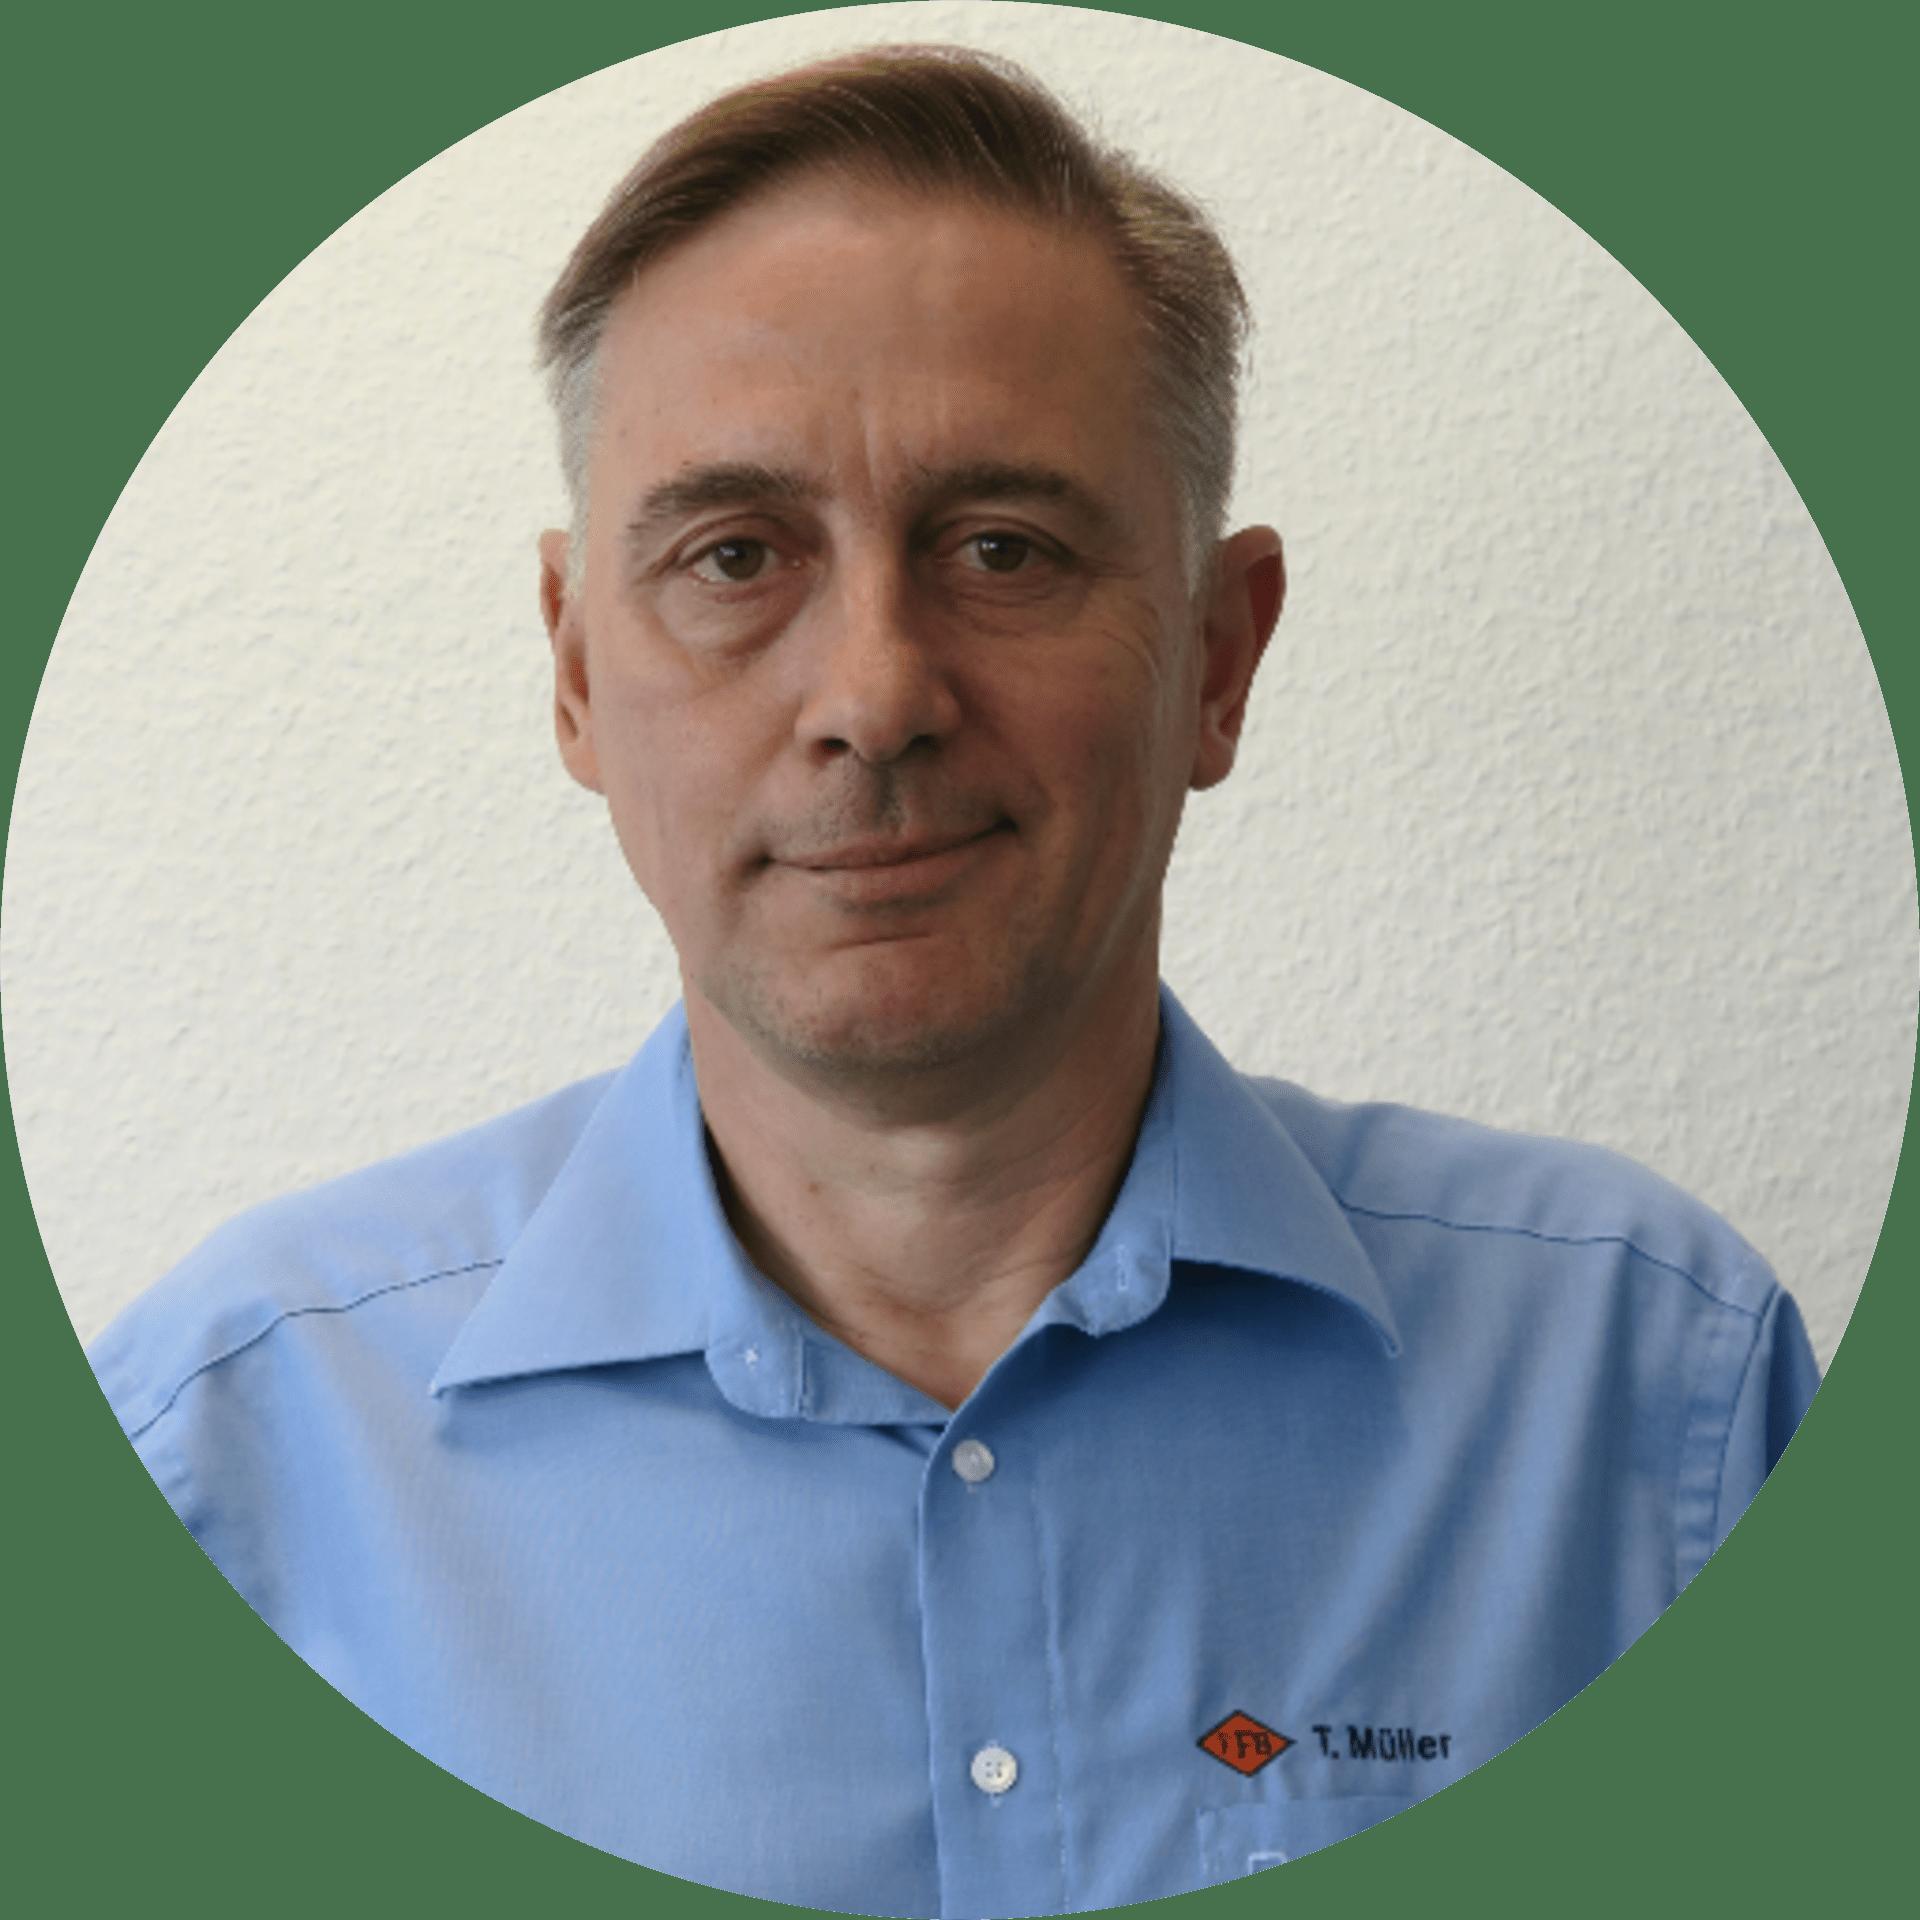 company contact Thomas Müller